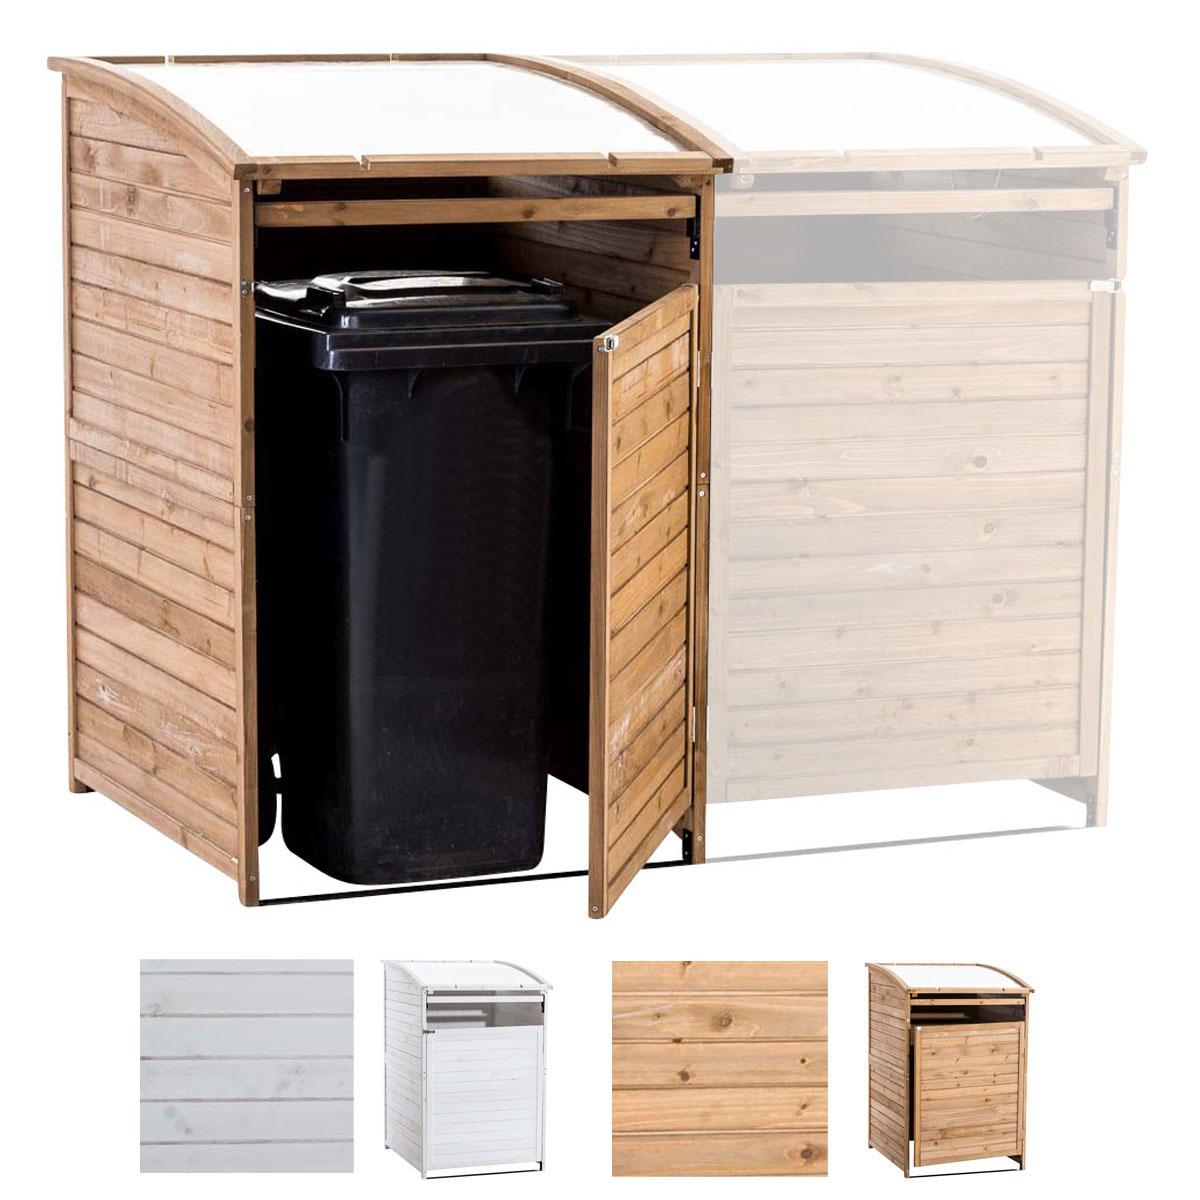 mülltonnenboxen | ebay, Moderne